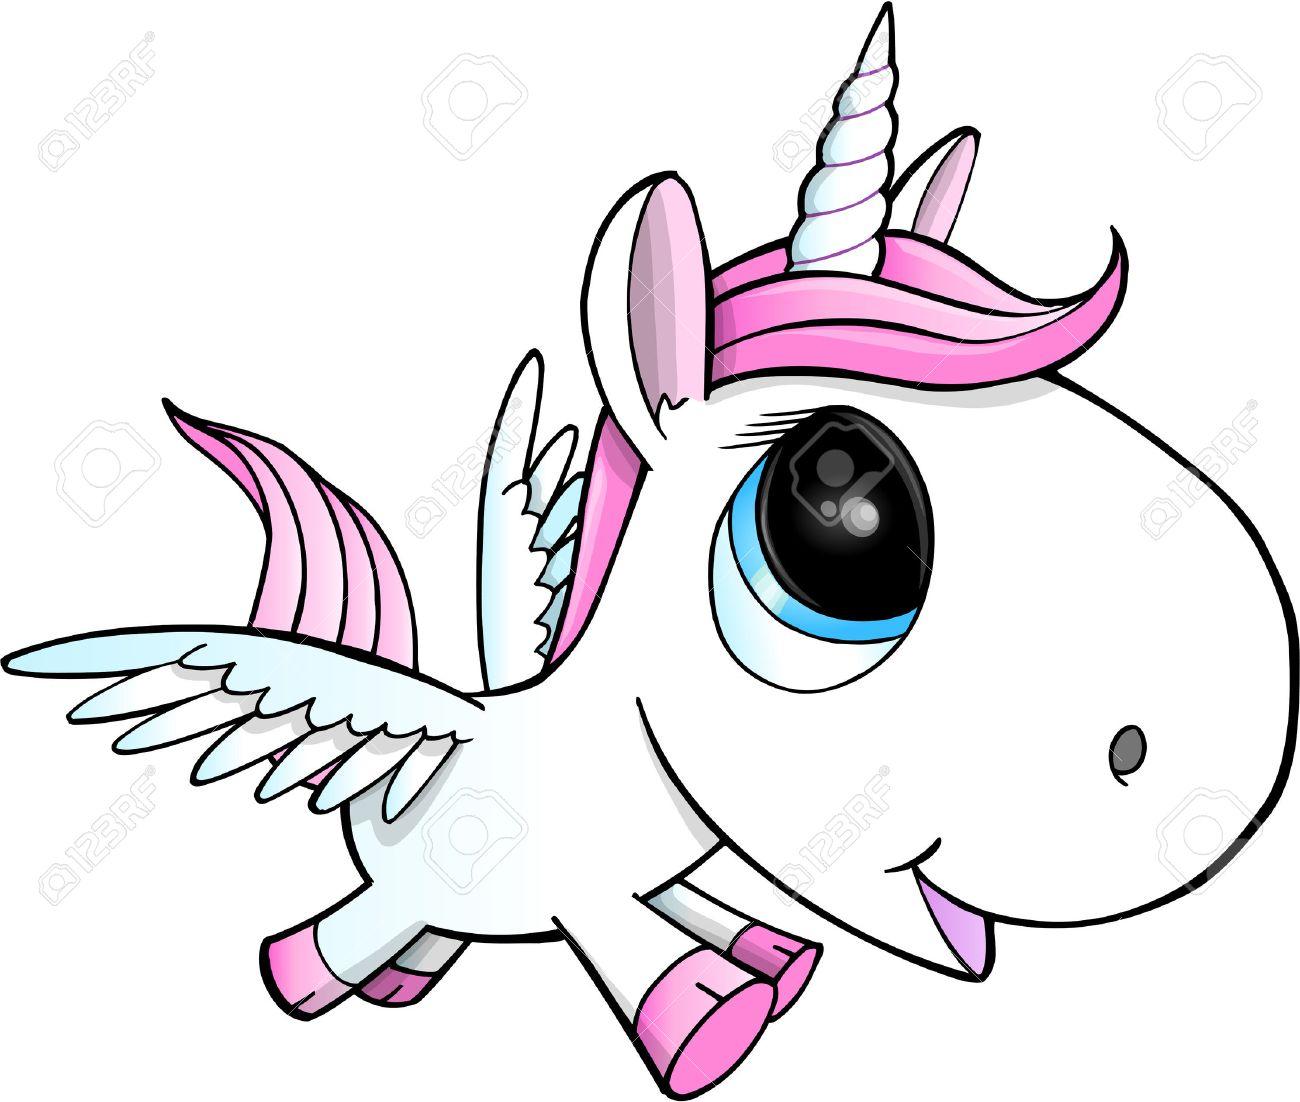 Cute Unicorn Pegasus Vector Illustration Art - 22972747